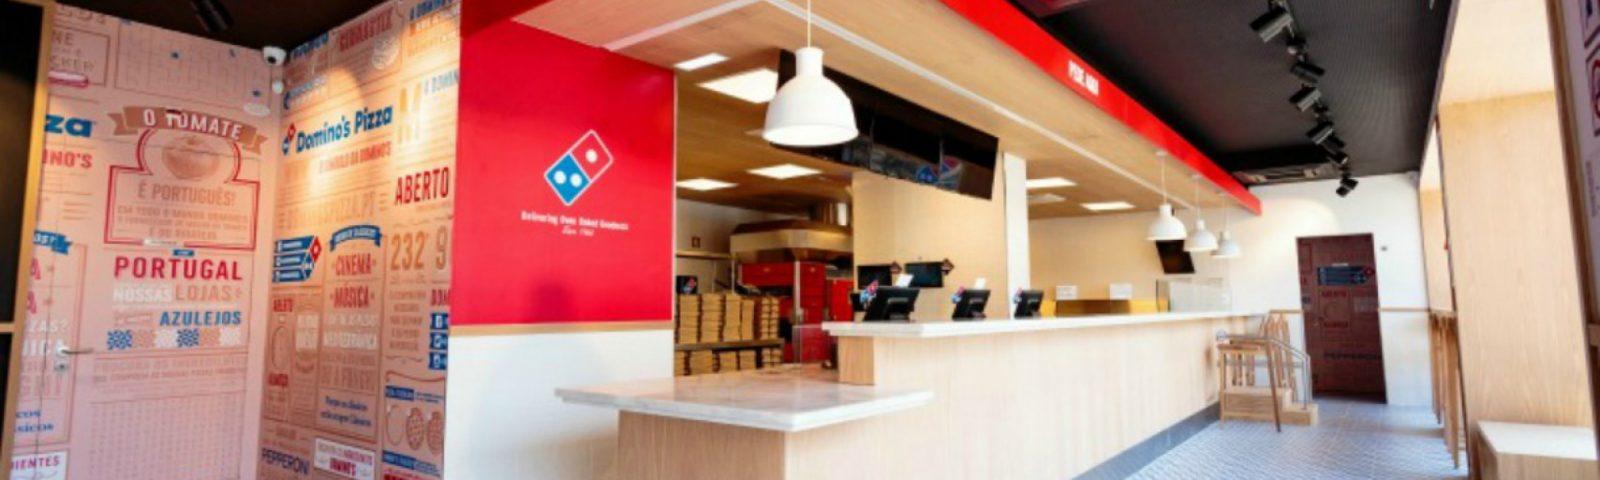 Grupo Cobega traz Domino's Pizza para Portugal